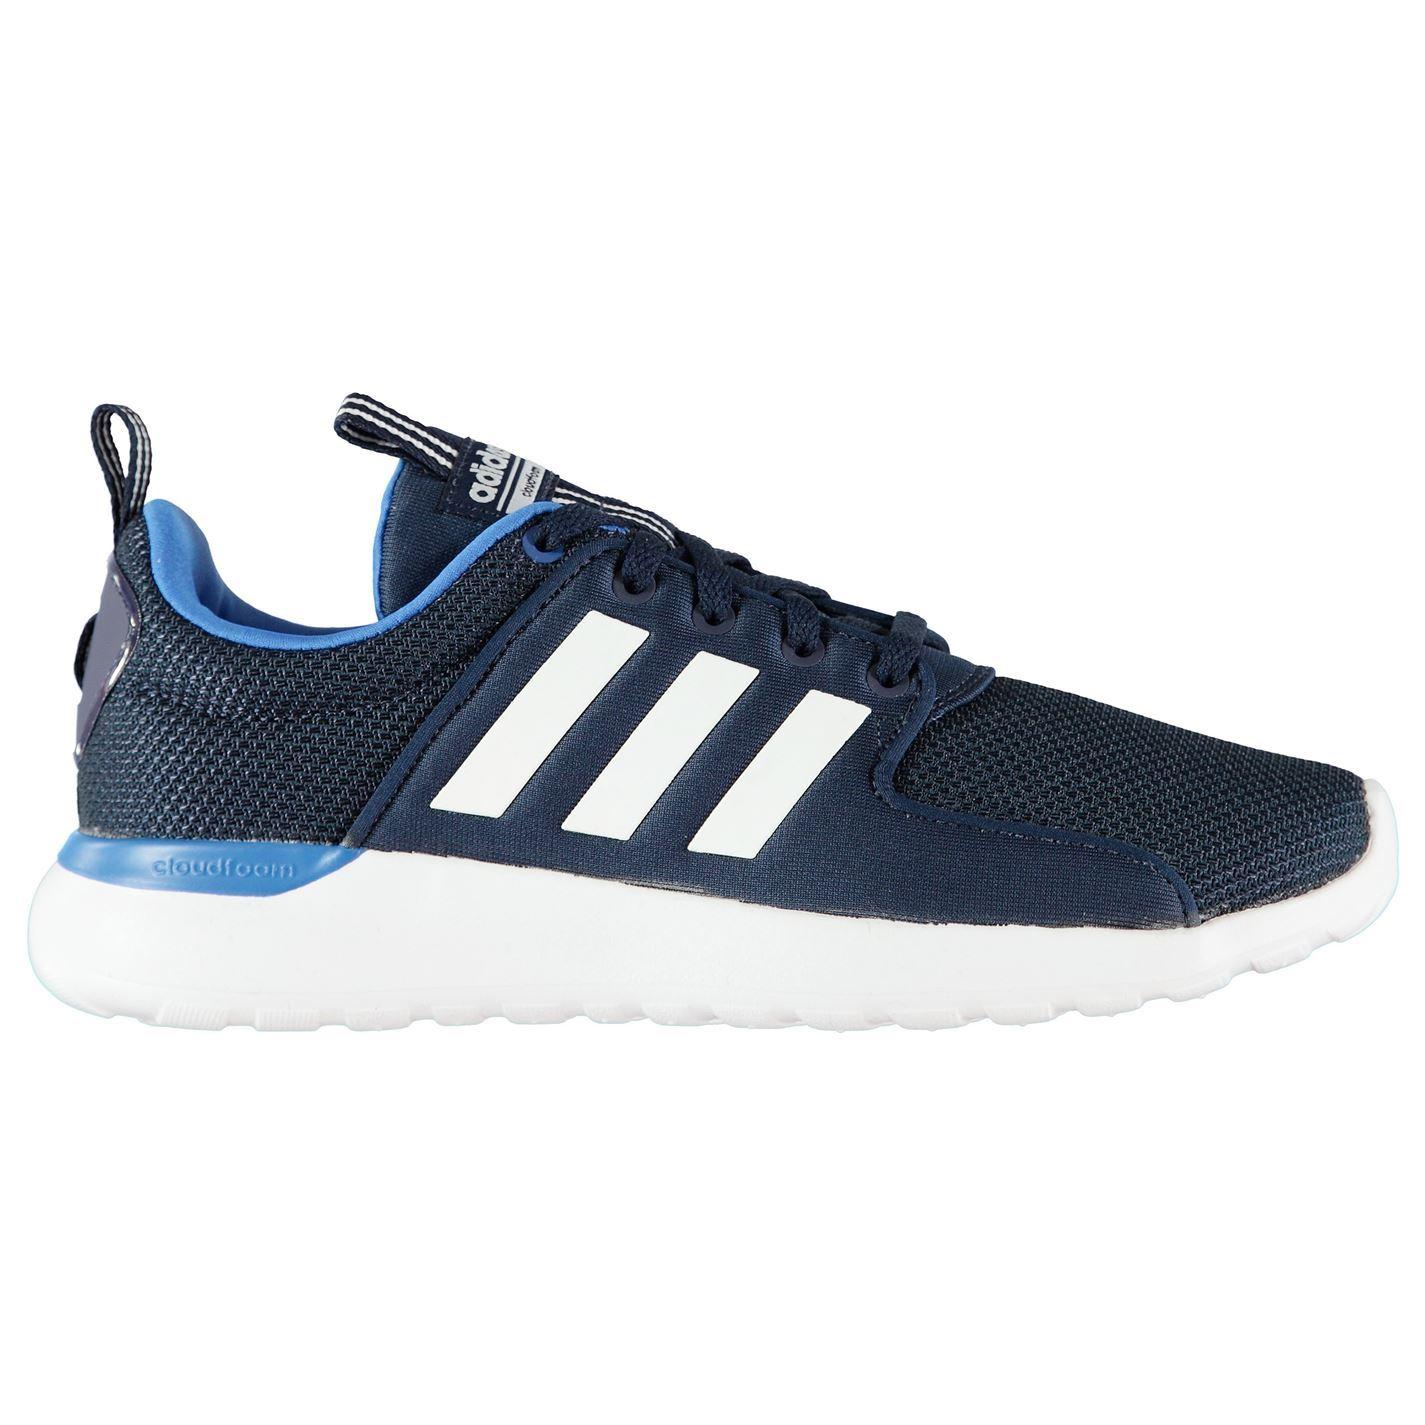 adidas cloudfoam trainers men blue